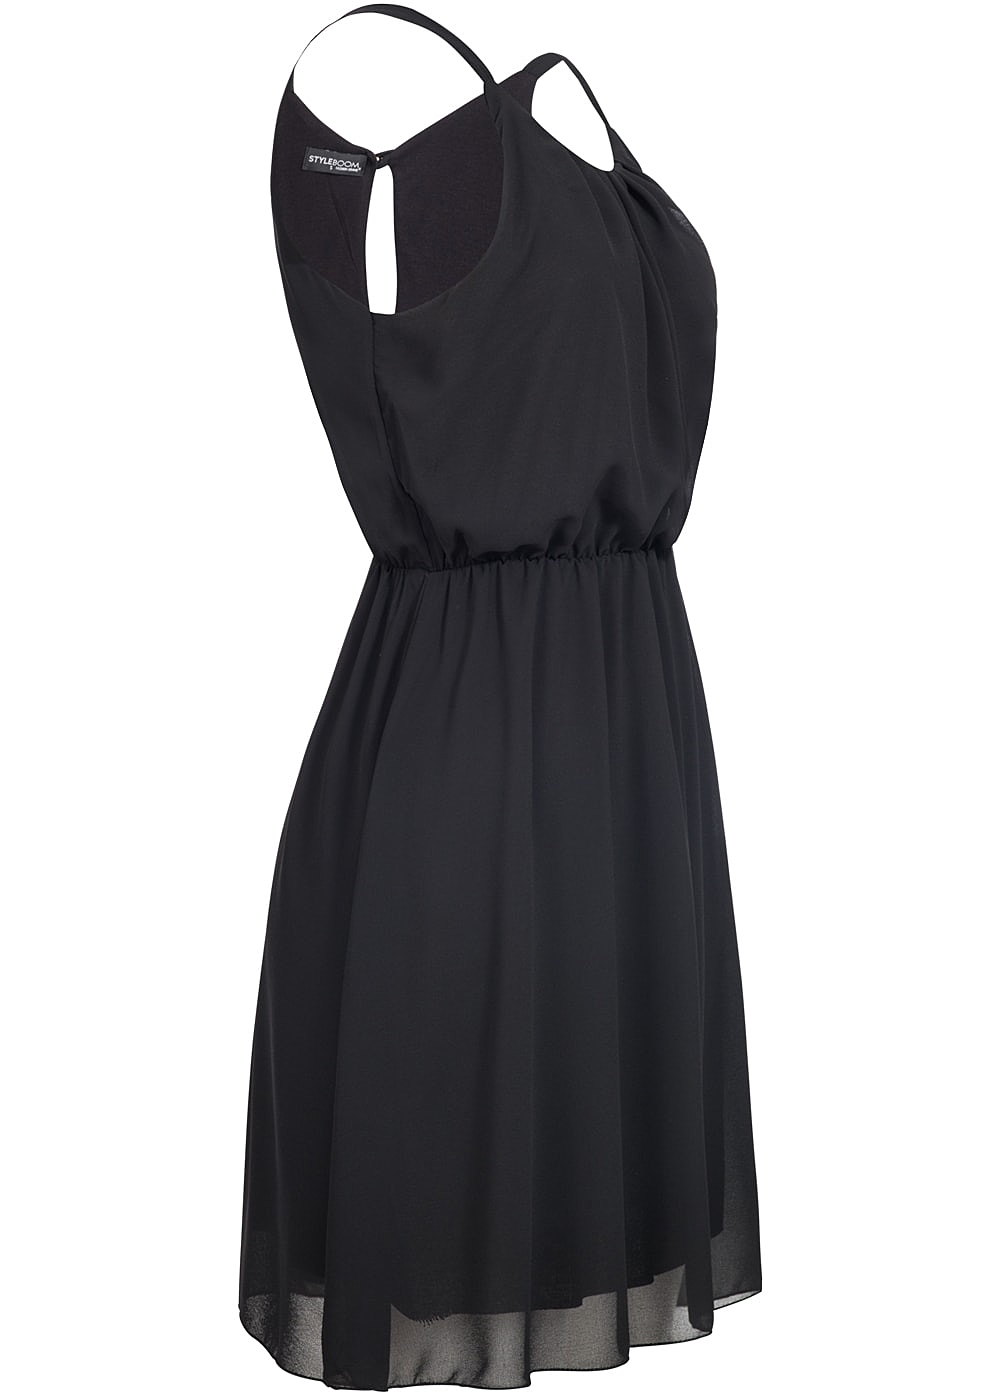 styleboom fashion damen chiffon kleid 2 lagig schwarz 77onlineshop. Black Bedroom Furniture Sets. Home Design Ideas